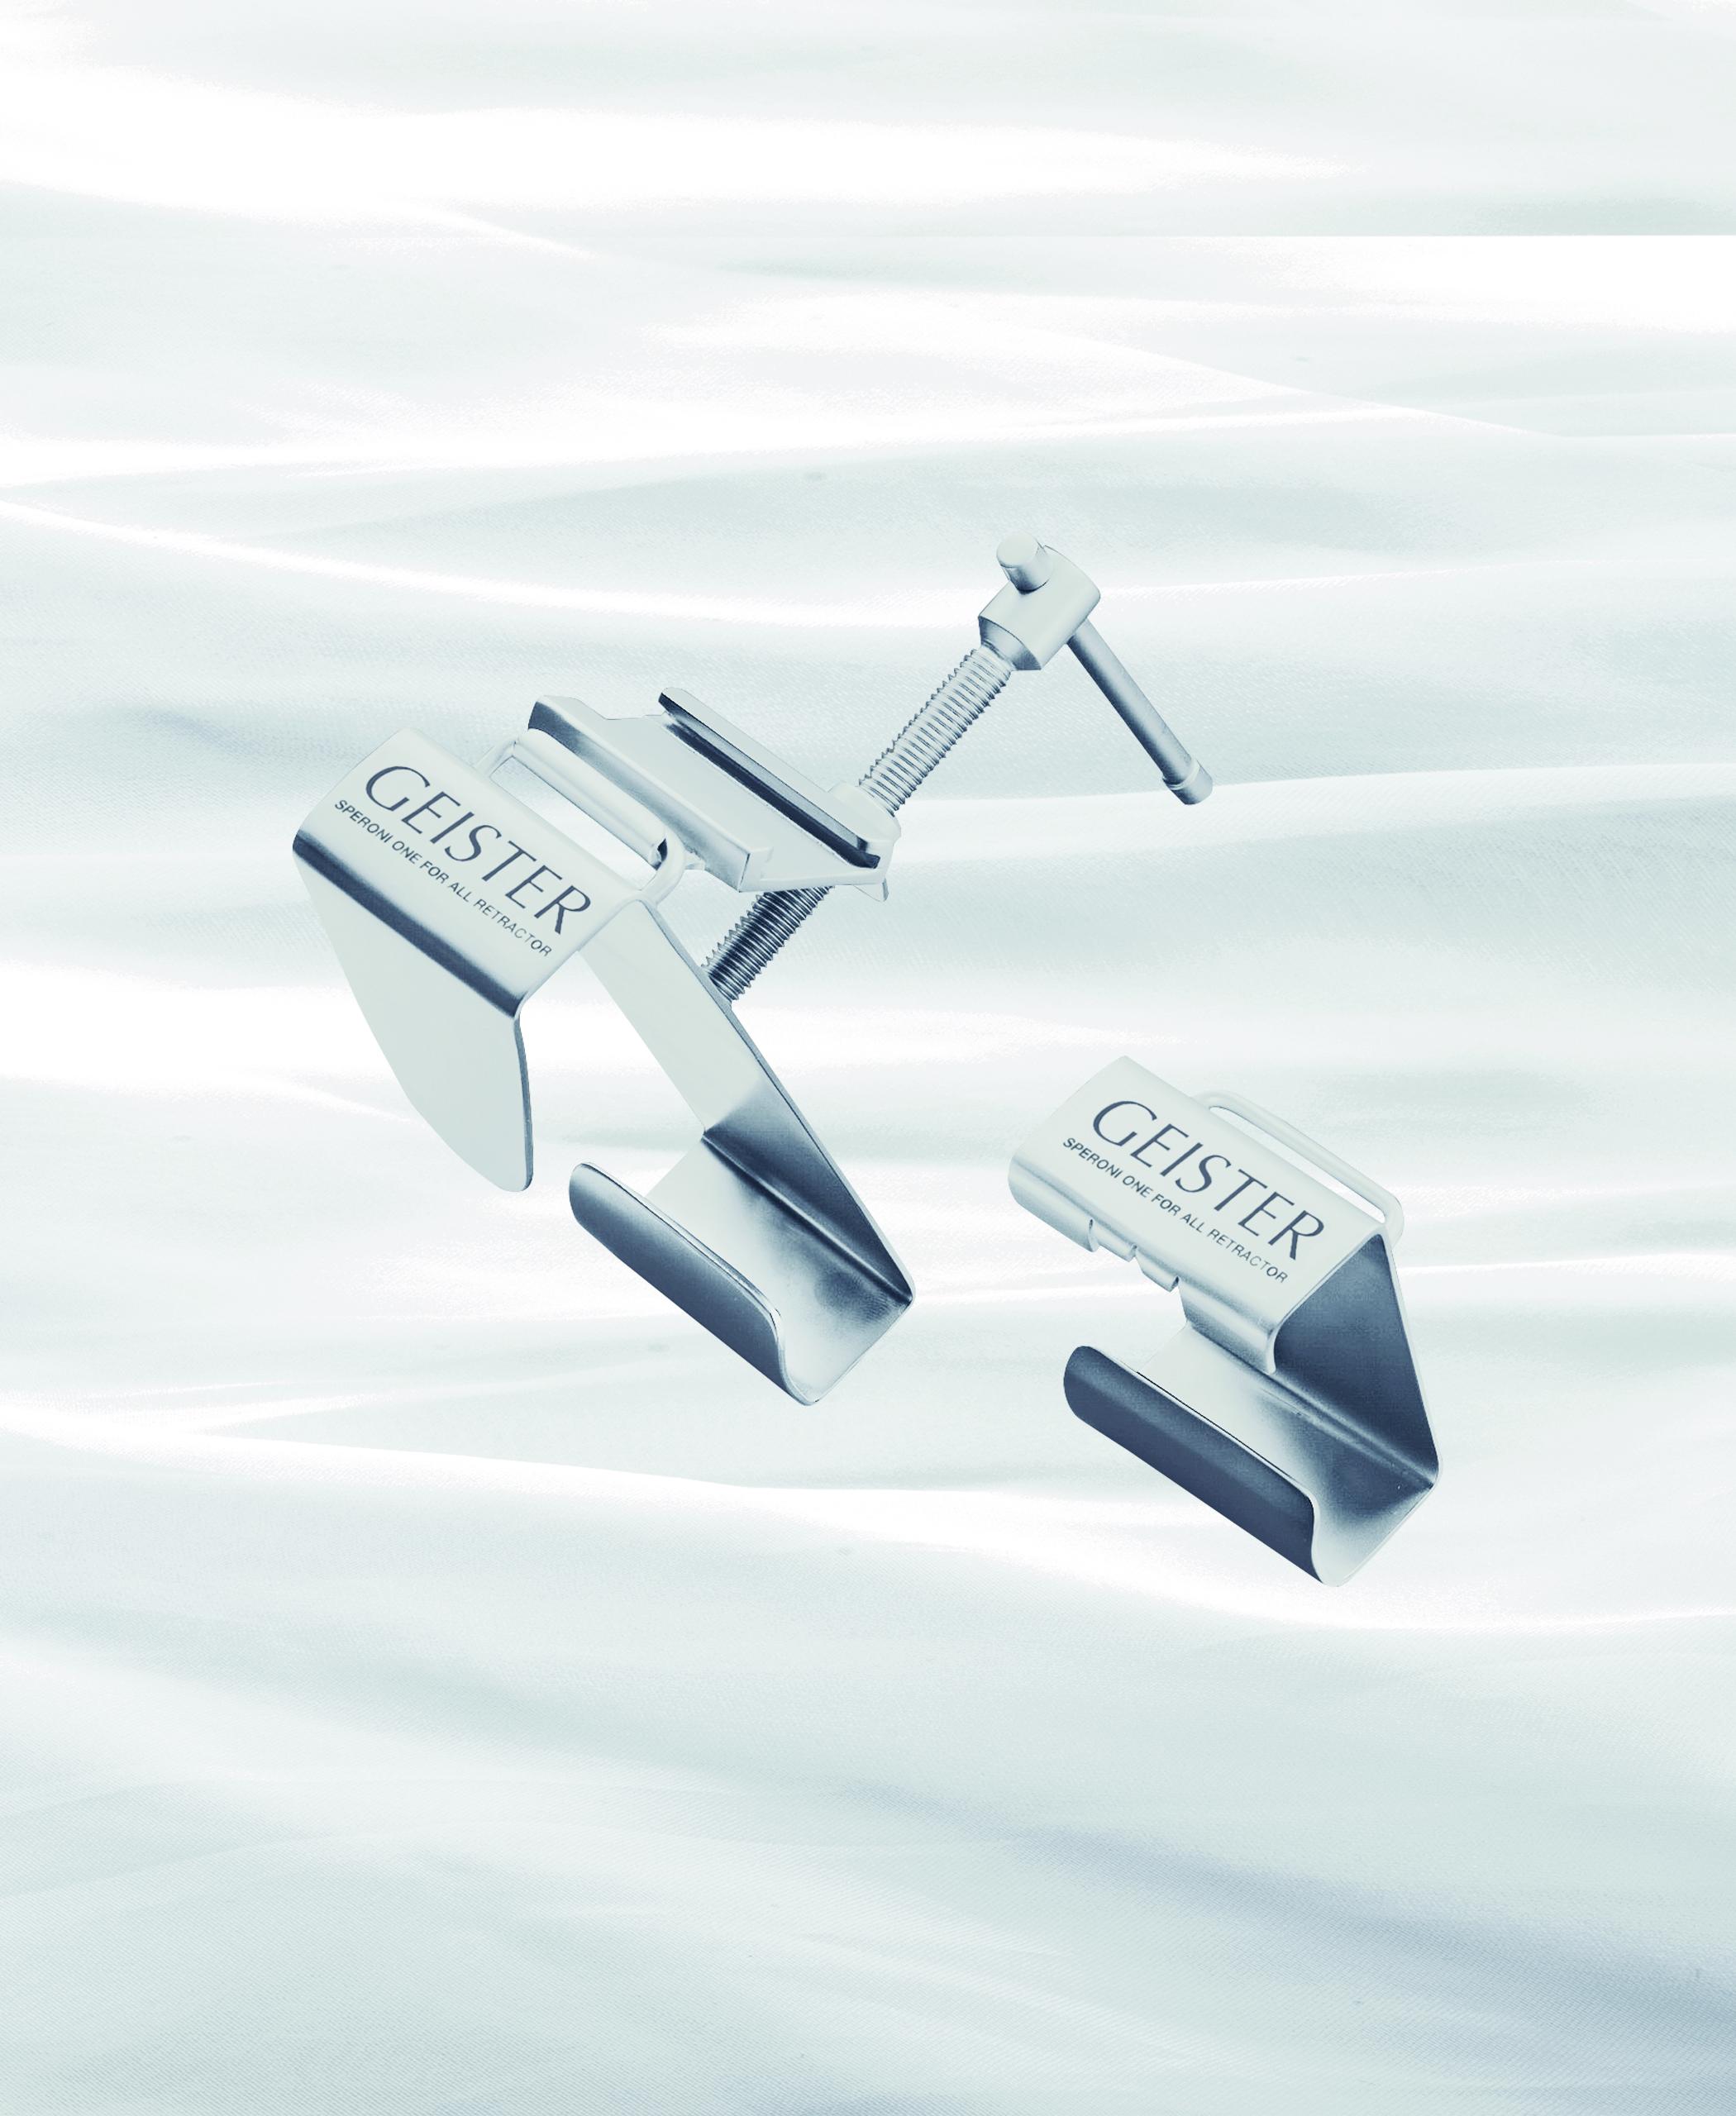 geister-speroni-retraktor-valven